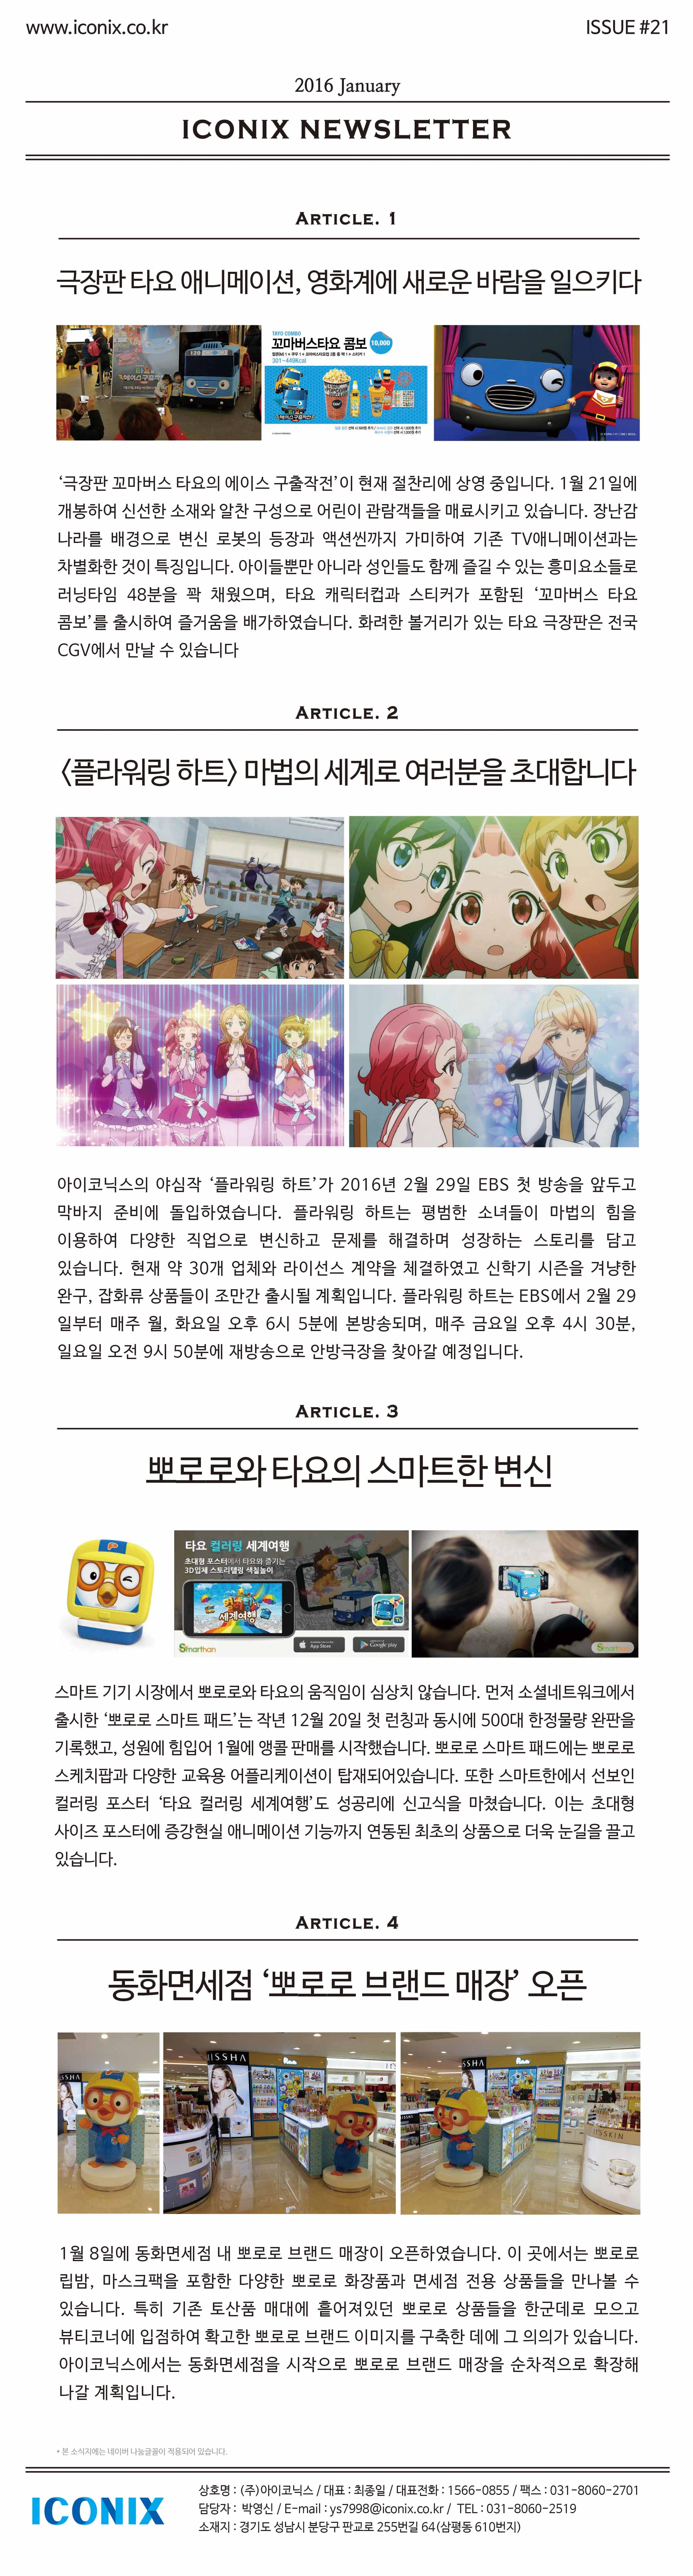 ICONIX_News Letter_1601.jpg